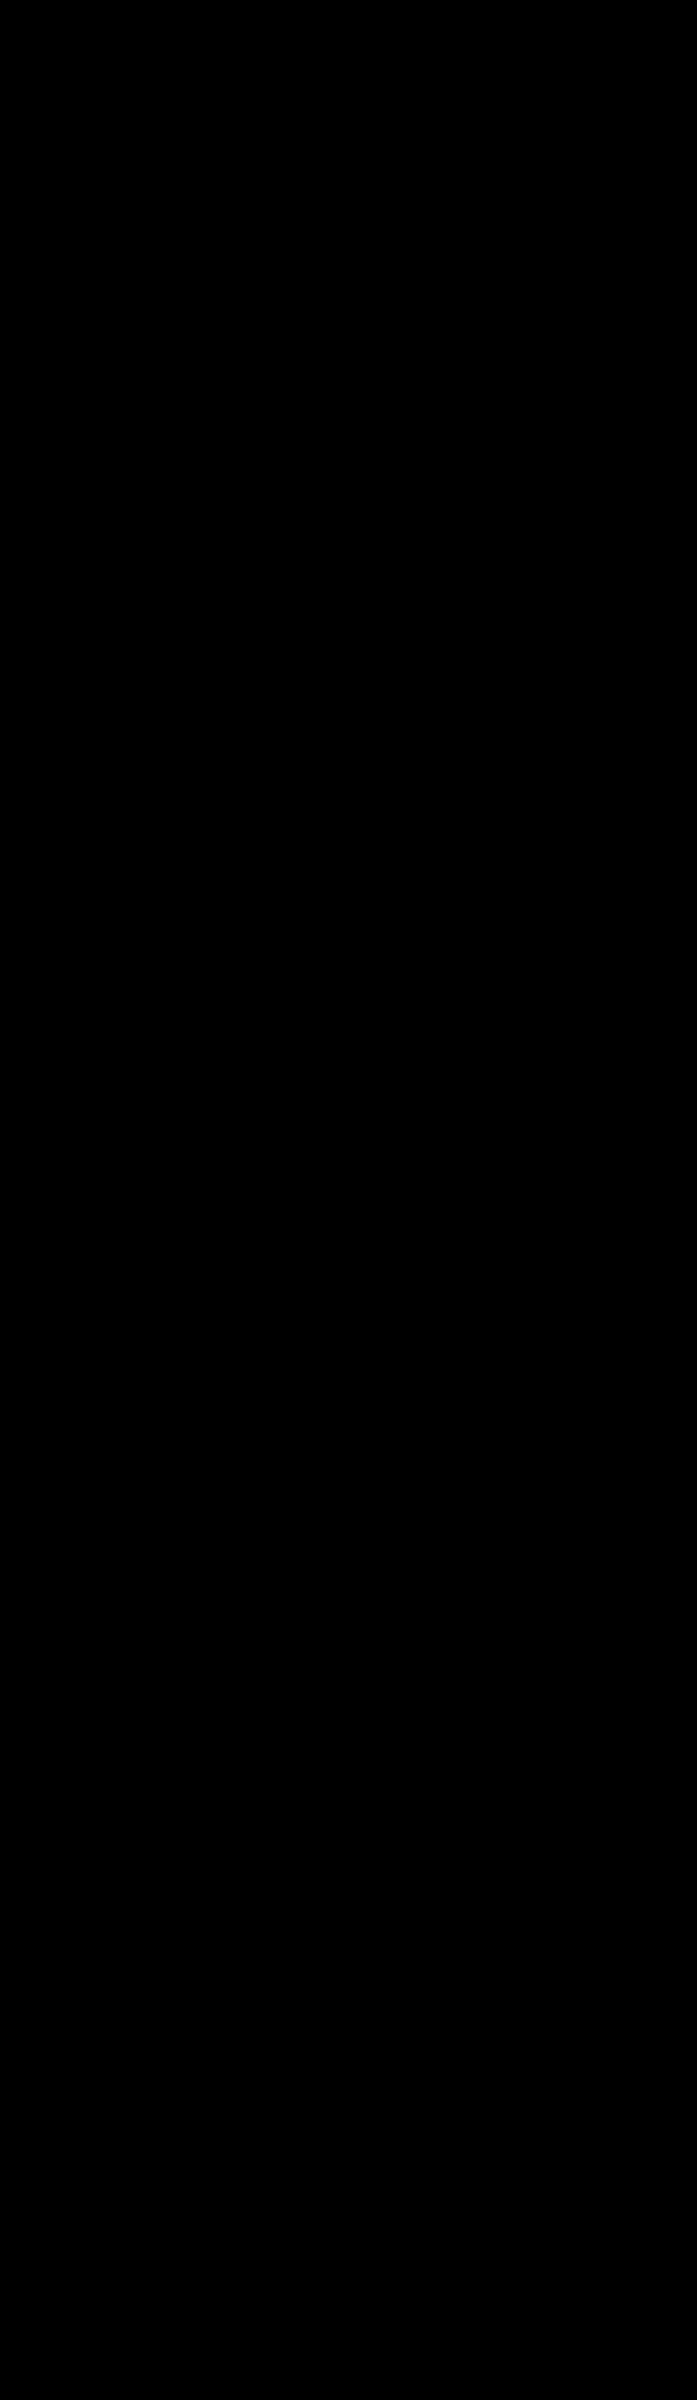 697x2400 Clipart